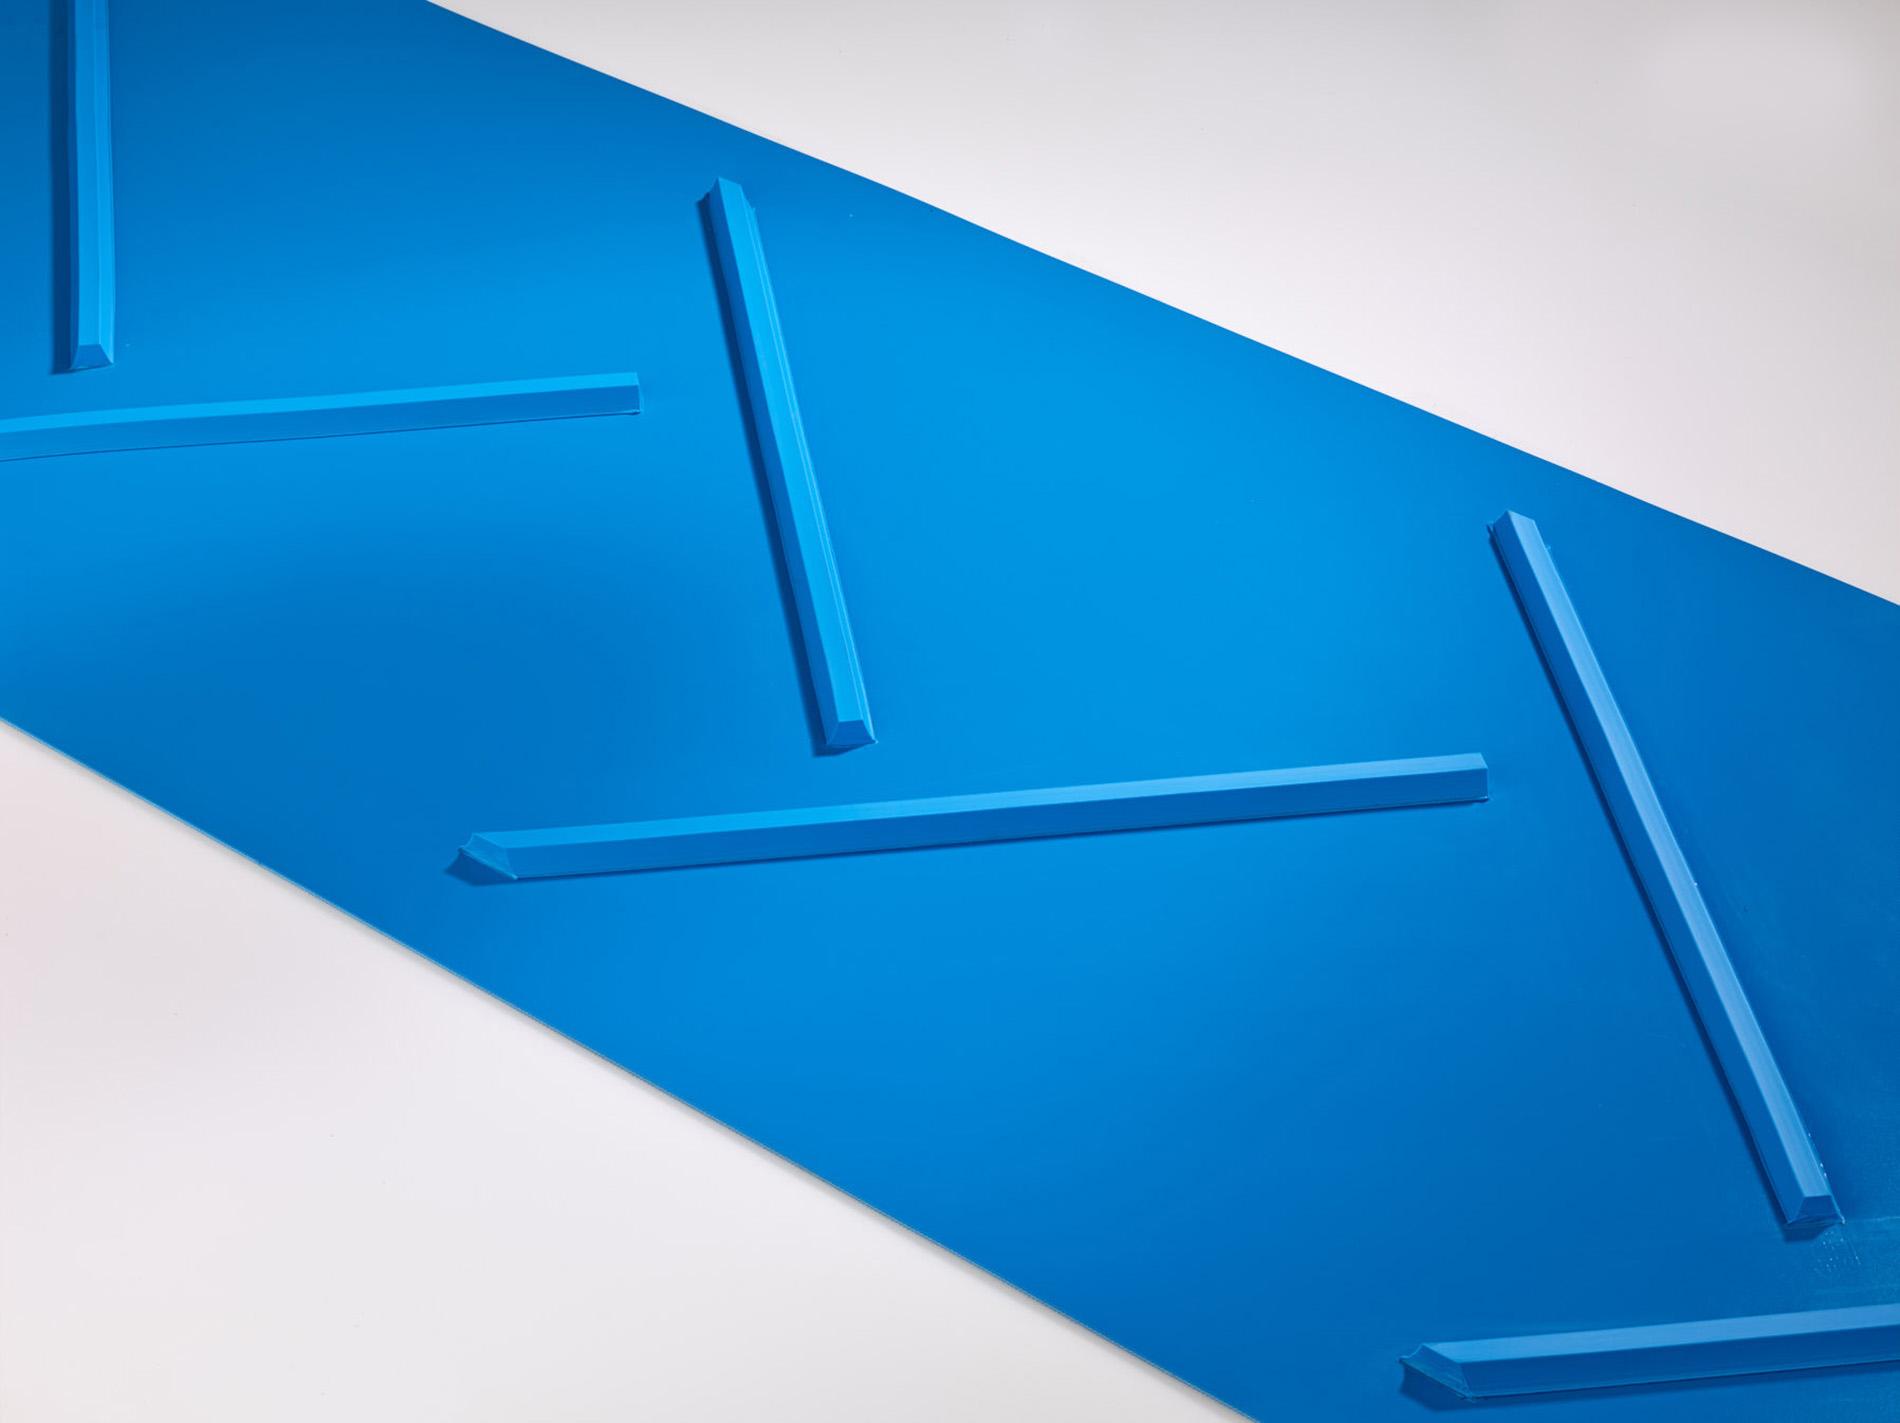 Fotodesign-Matthias-Schütz-transportband-blau2